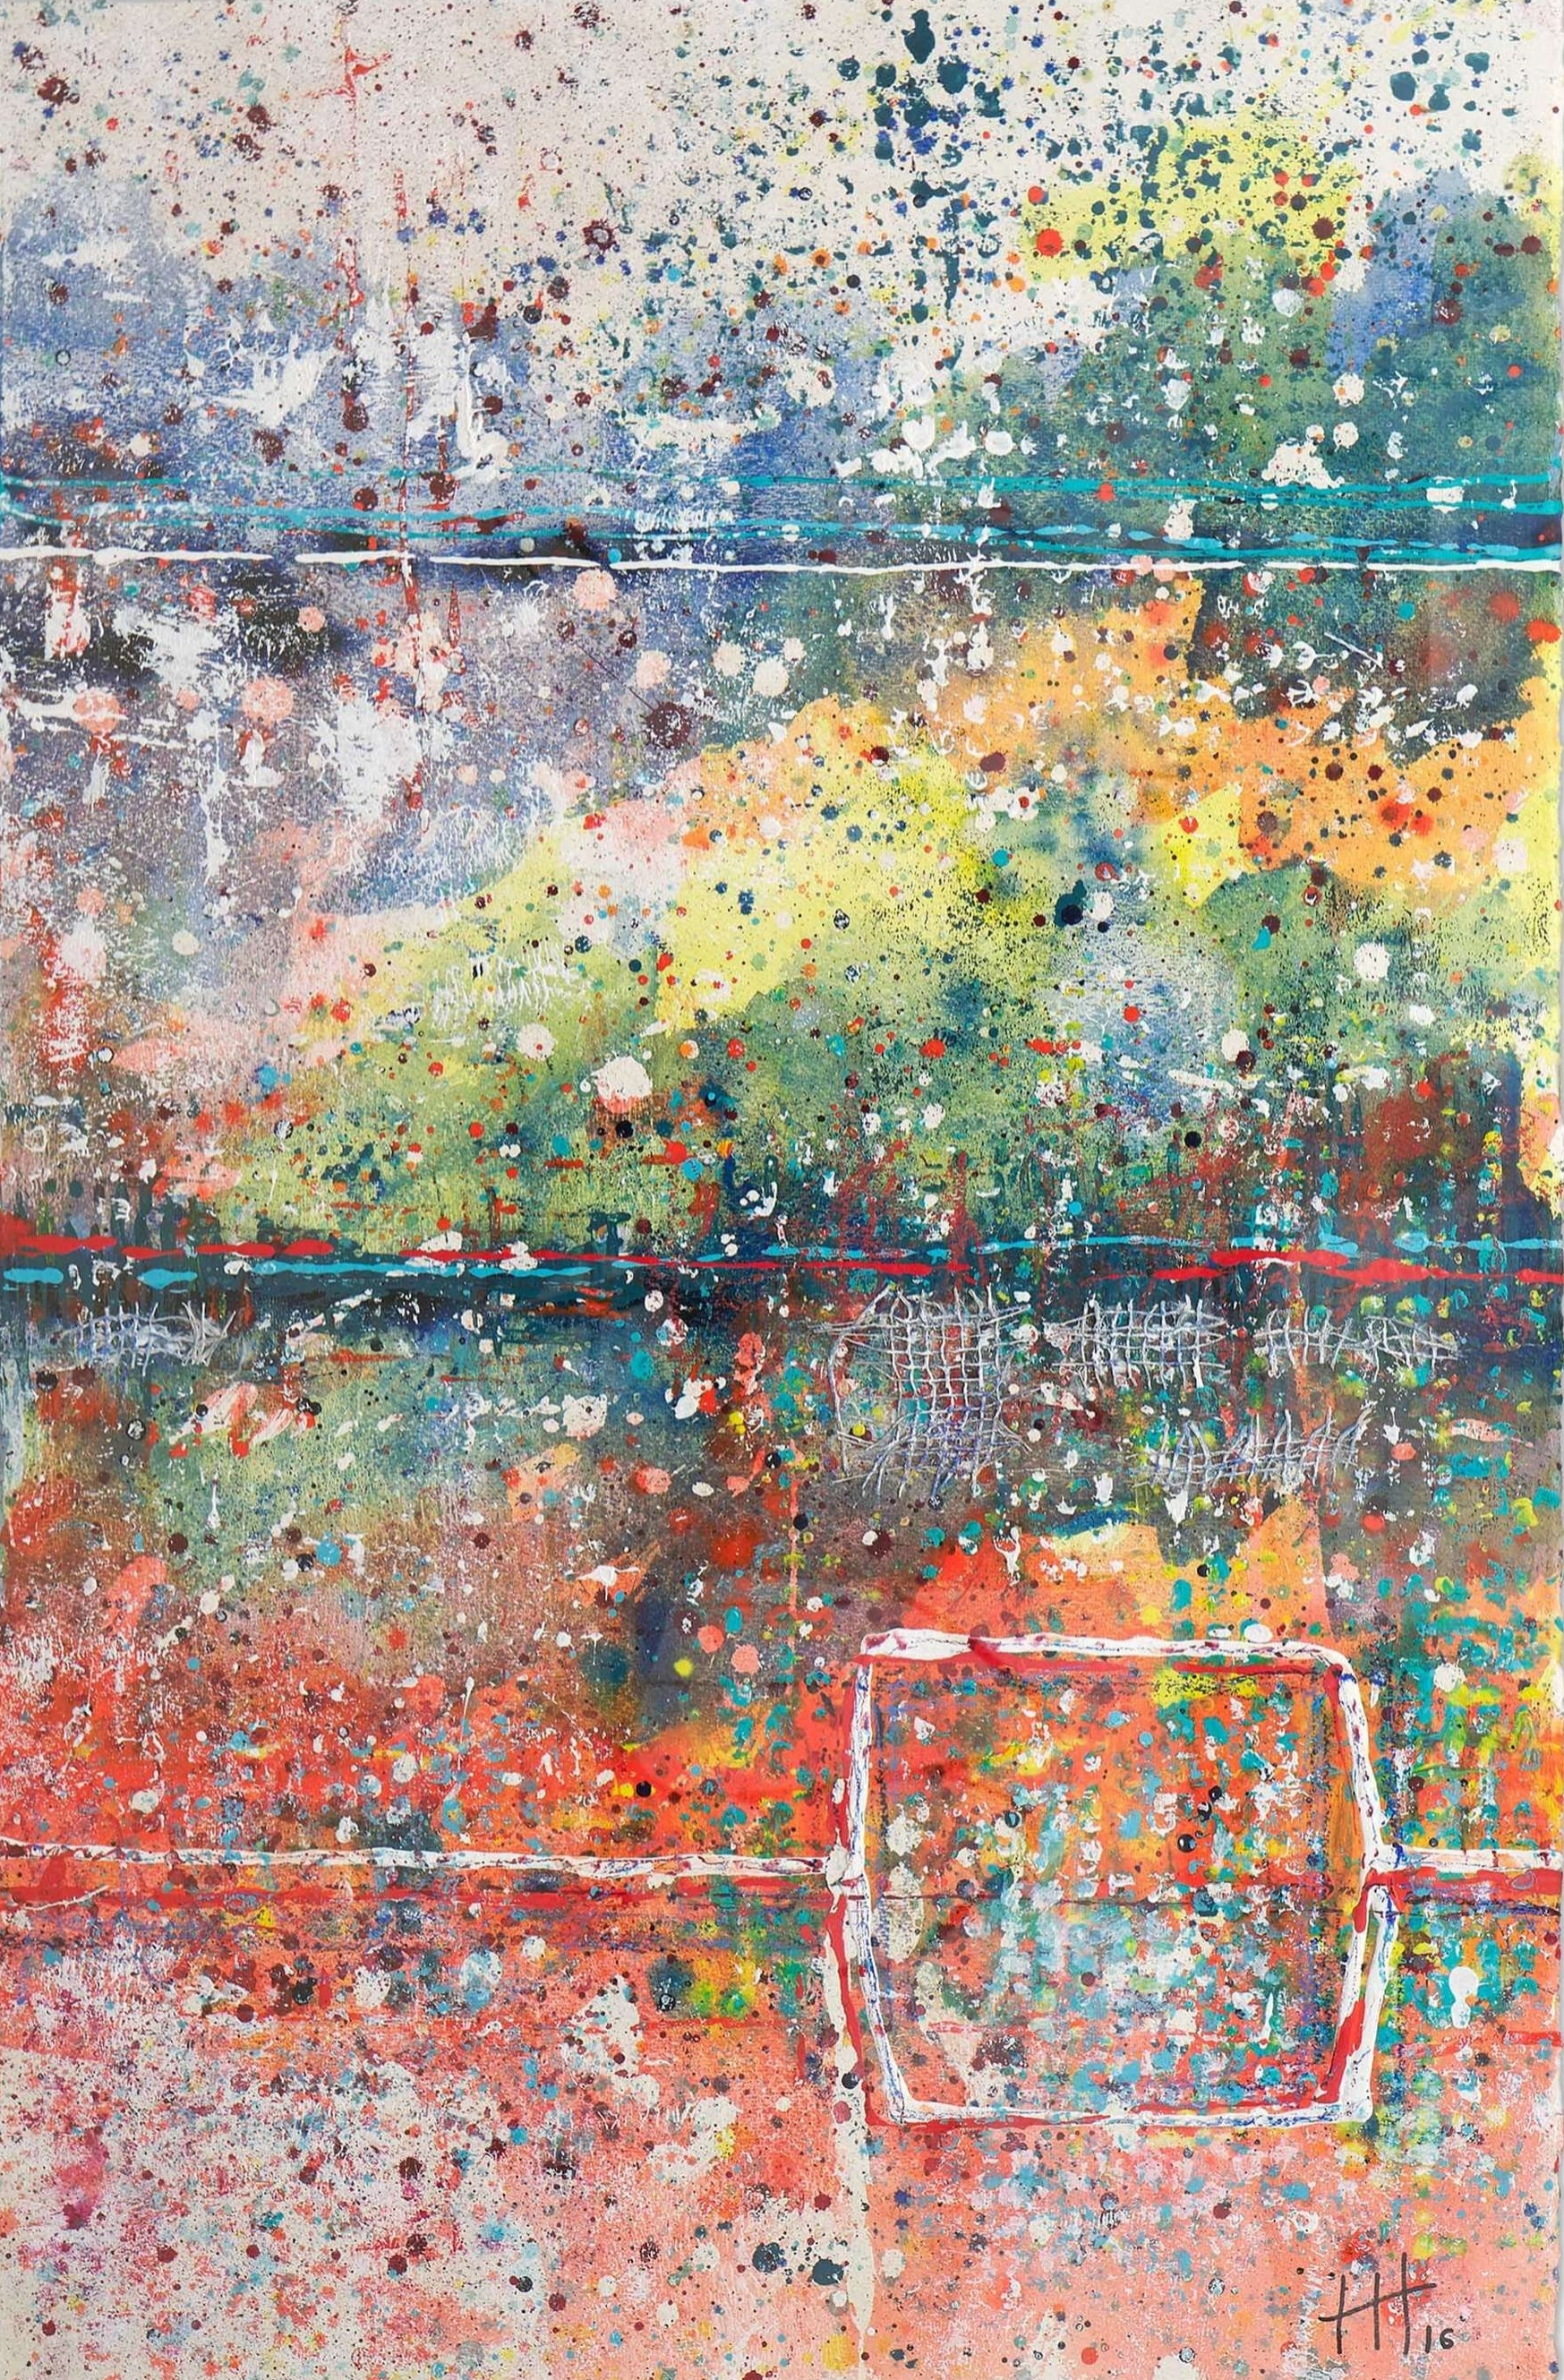 'Untitled' Acrylic & Mixed Media / 129cm x 93cm (framed) SOLD